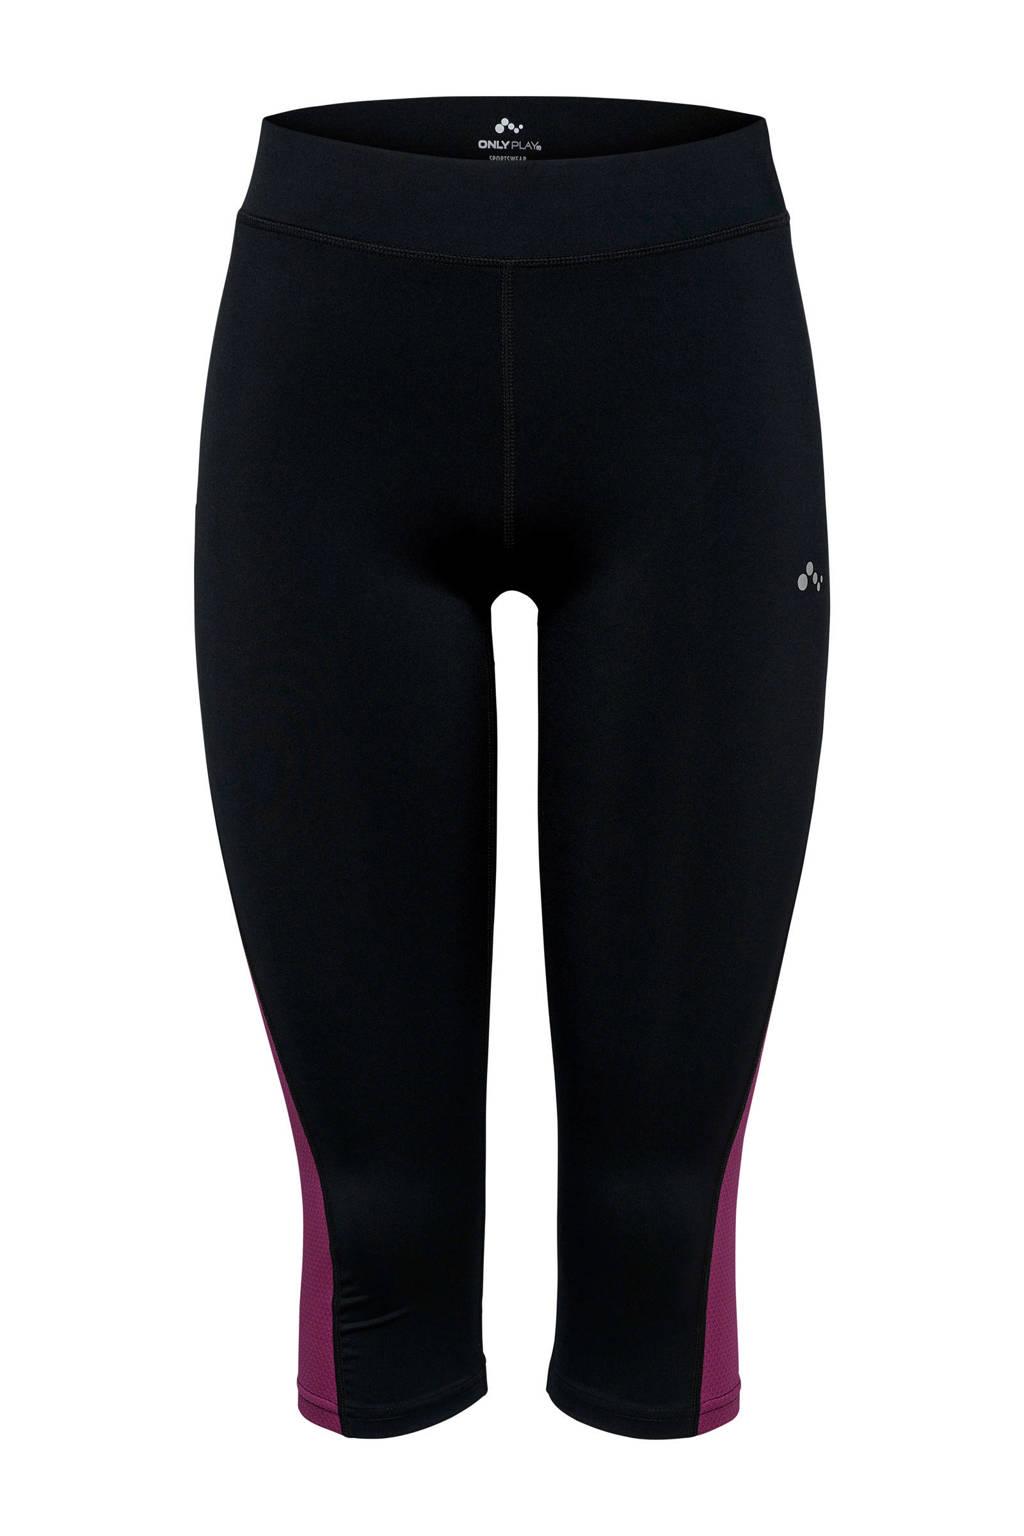 Only Play Curvy sportbroek zwart/paars, Zwart/paars